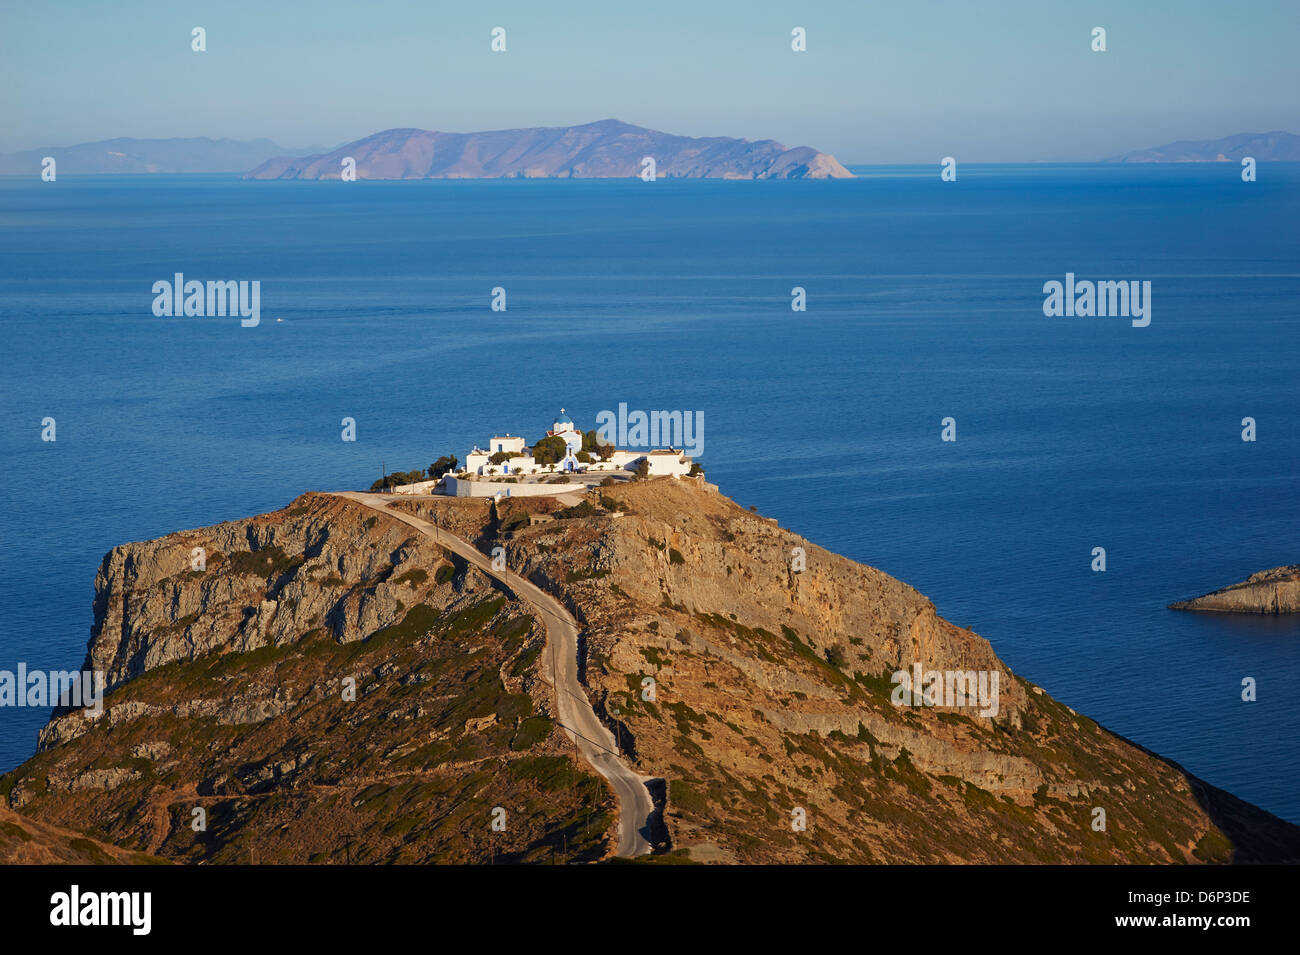 Agios Sostis Monastery, Kea Island, Cyclades, Greek Islands, Greece, Europe - Stock Image